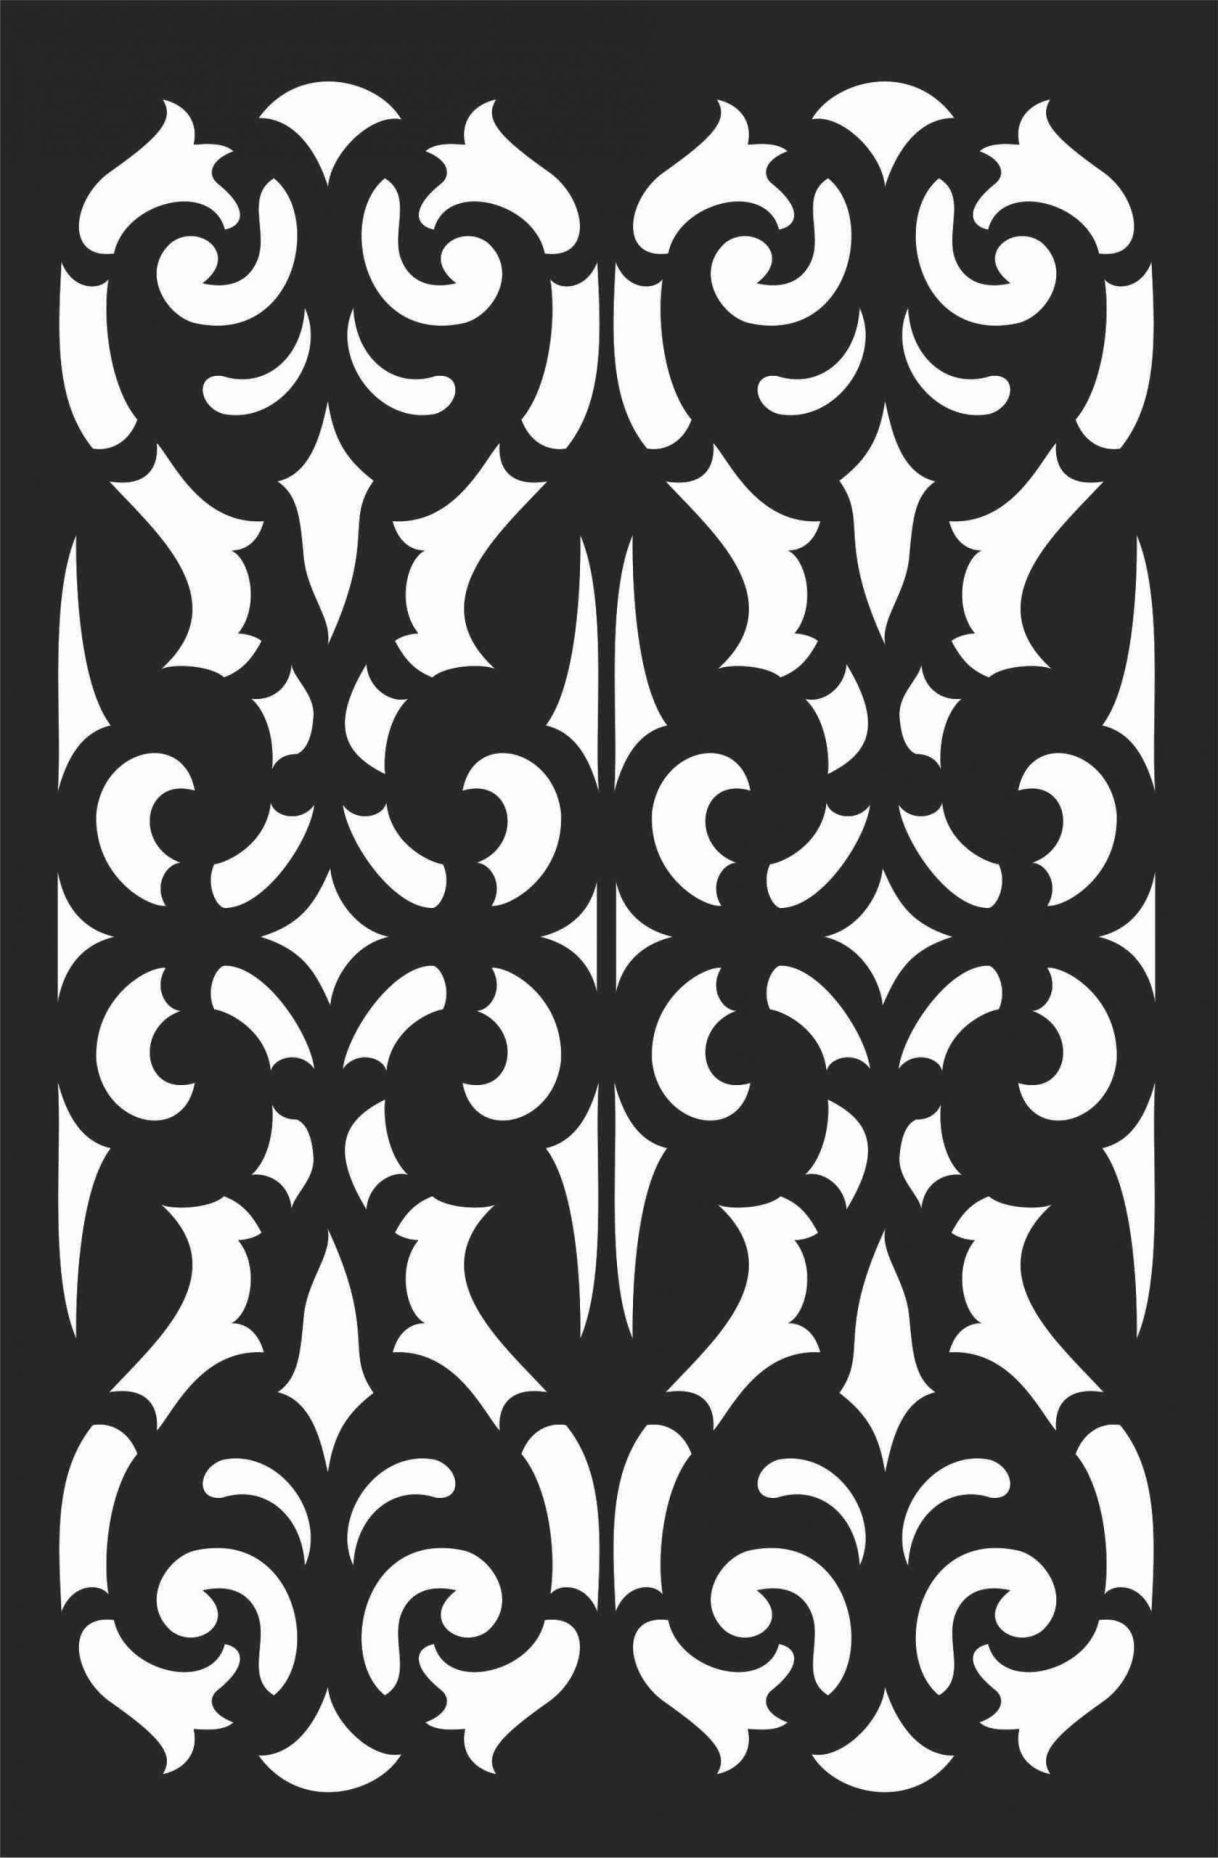 Screen Panel Patterns Seamless 87 Free DXF File